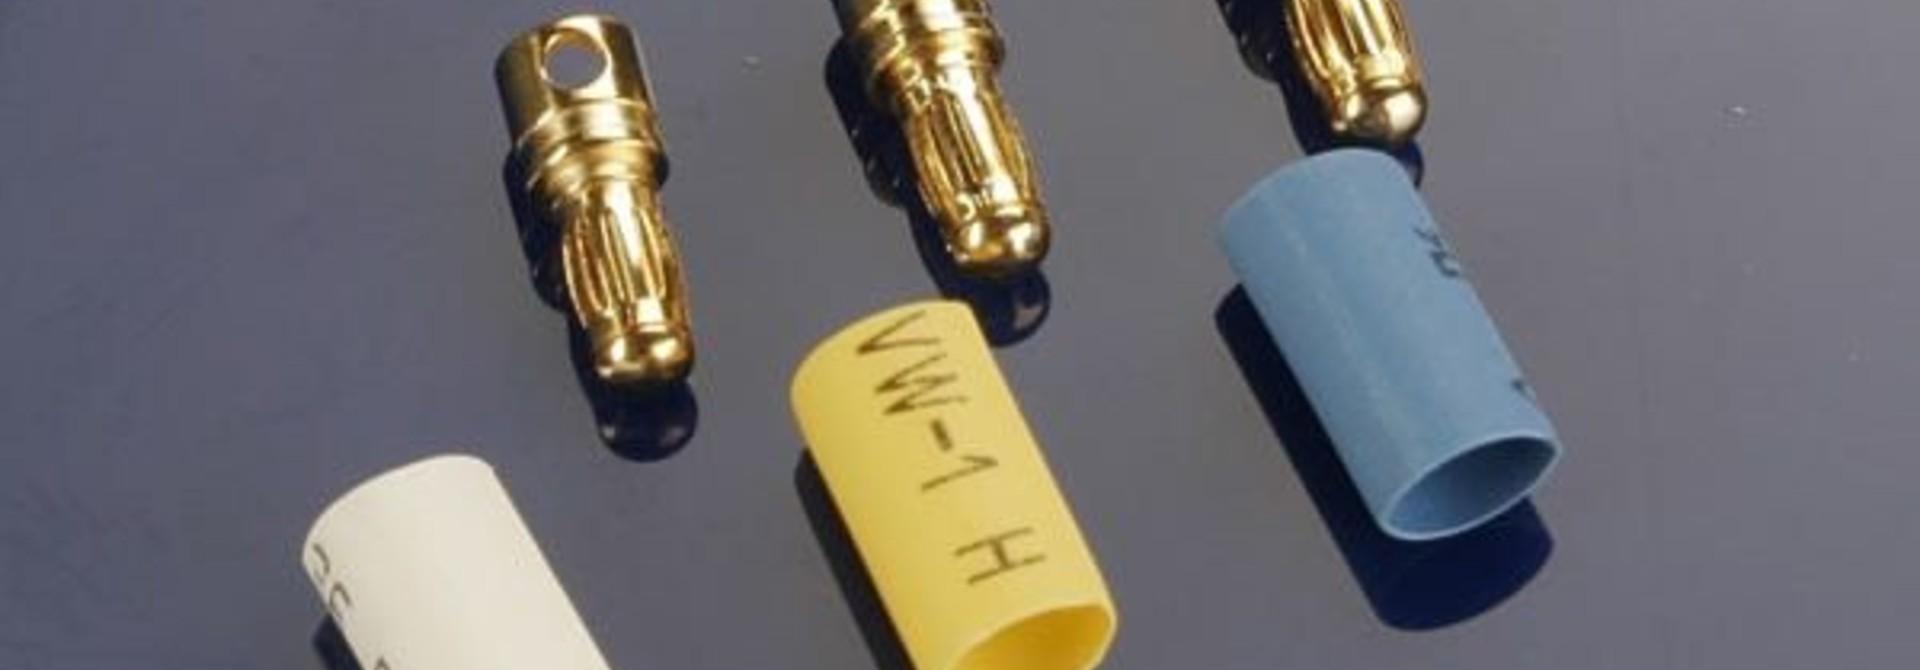 Bullet connectors, male, 3.5mm (3) / heat shrink, TRX3342